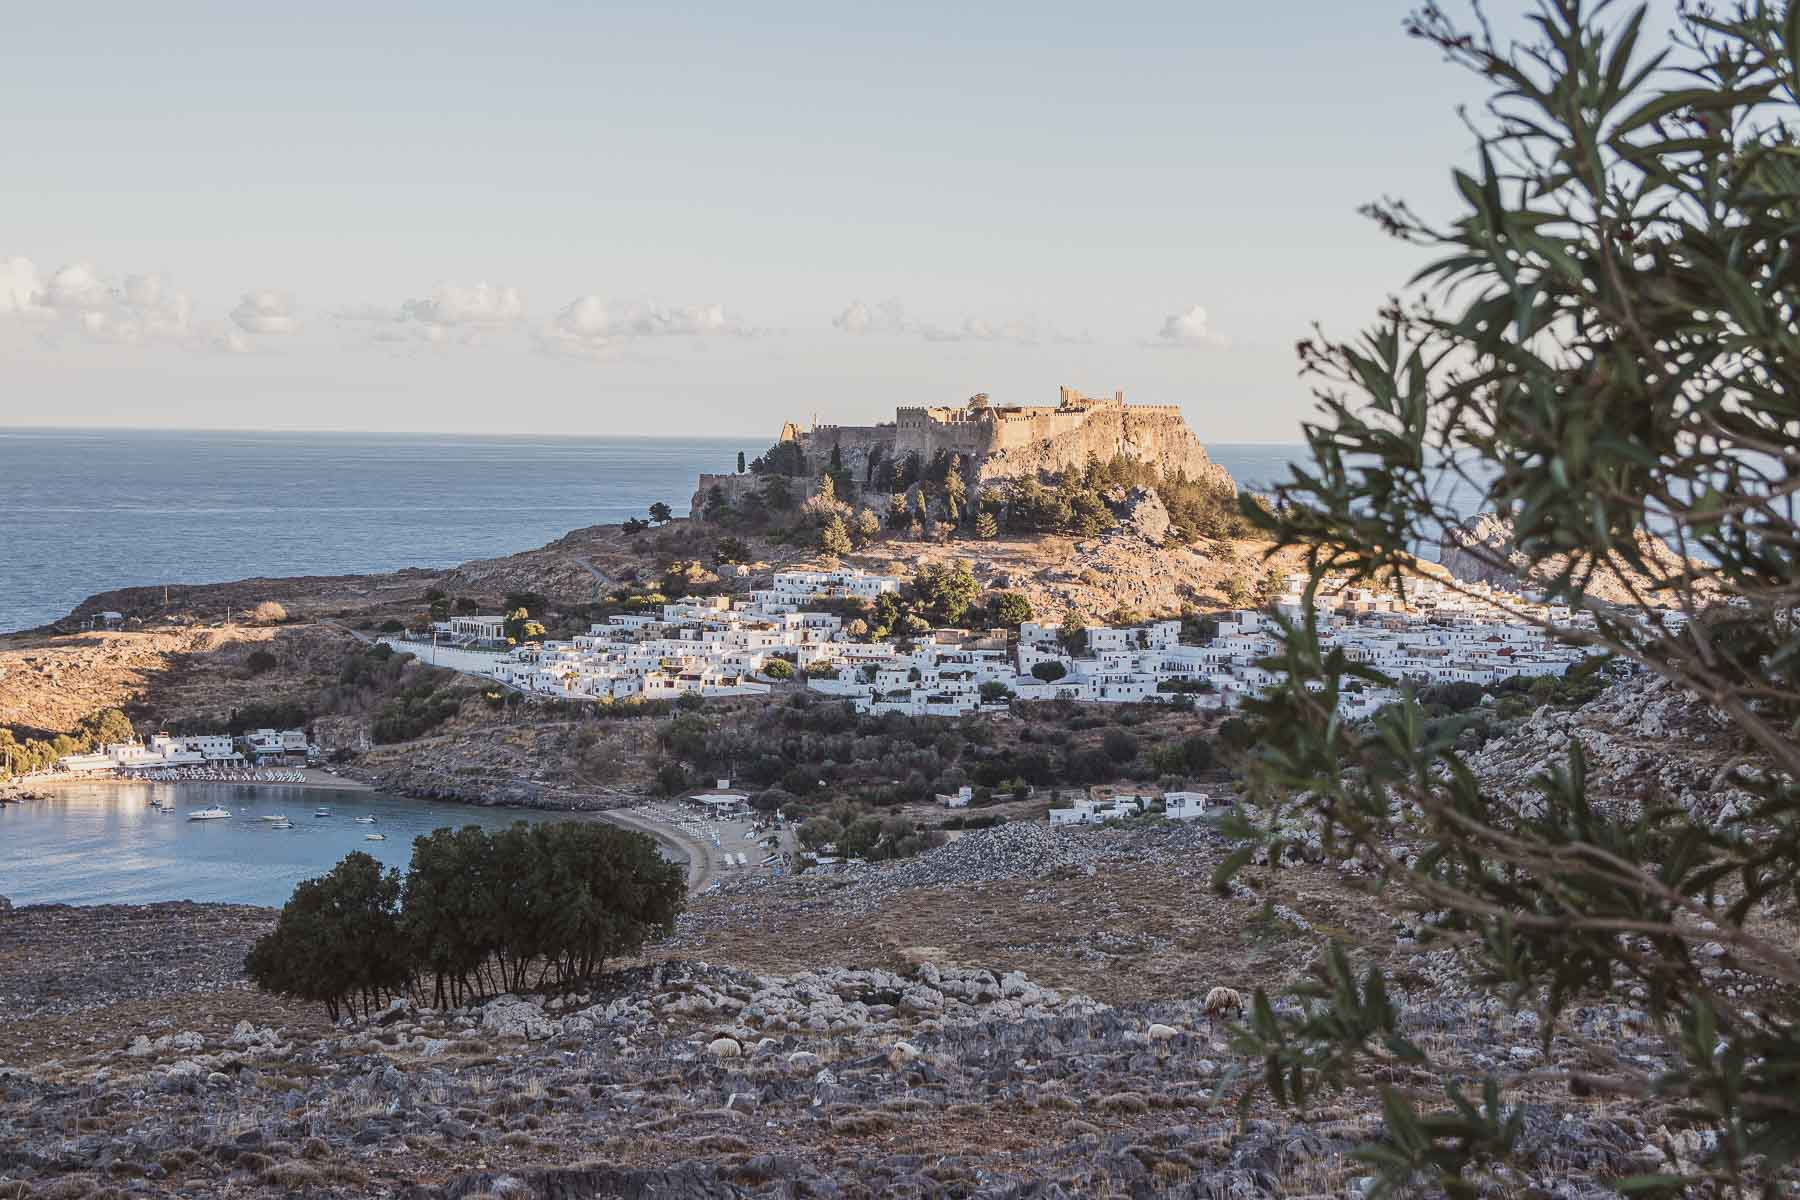 Urlaub auf Rhodos The Travel Happiness